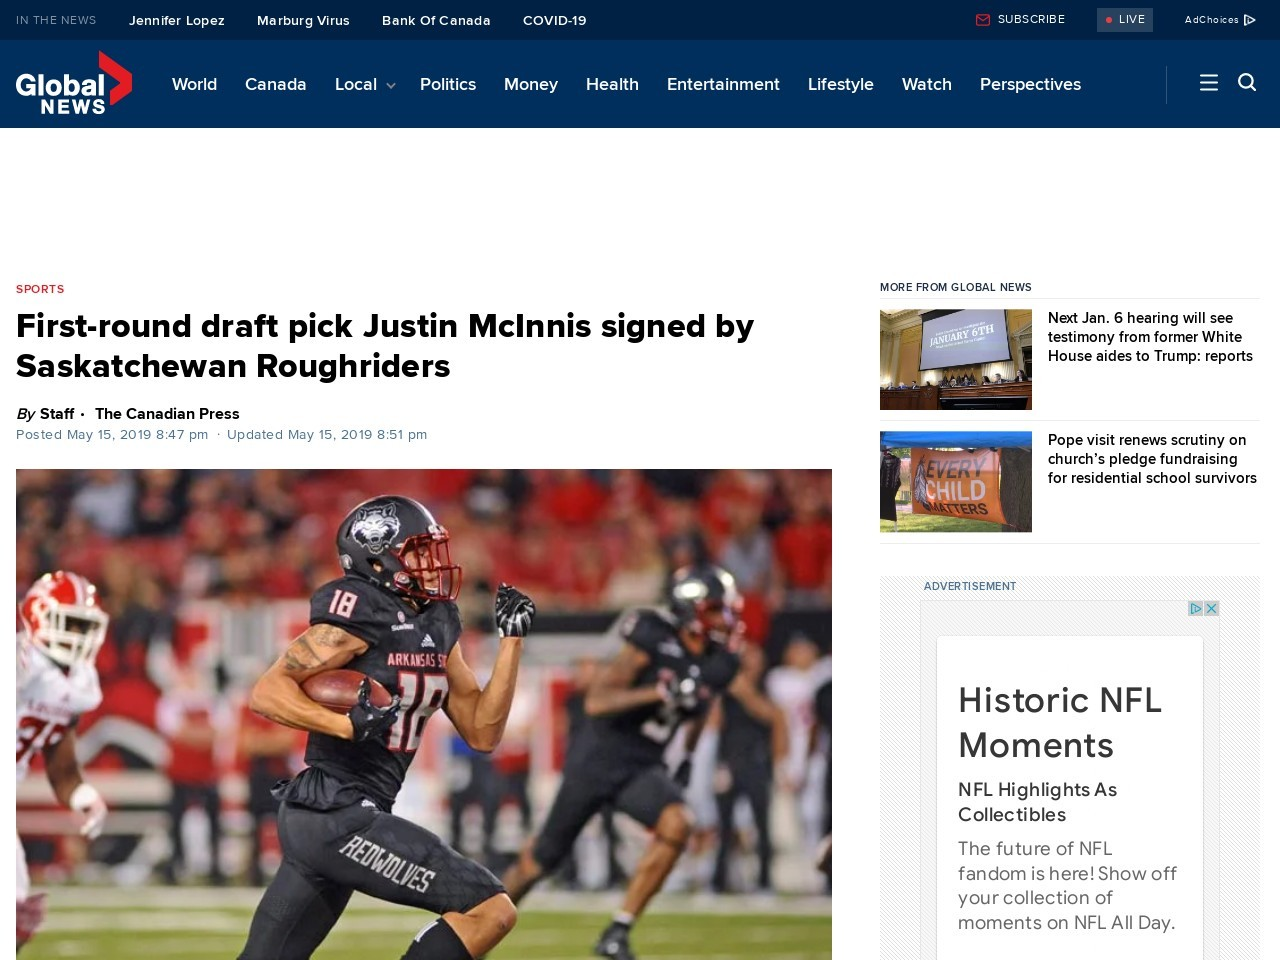 First-round draft pick Justin McInnis signed by Saskatchewan Roughriders